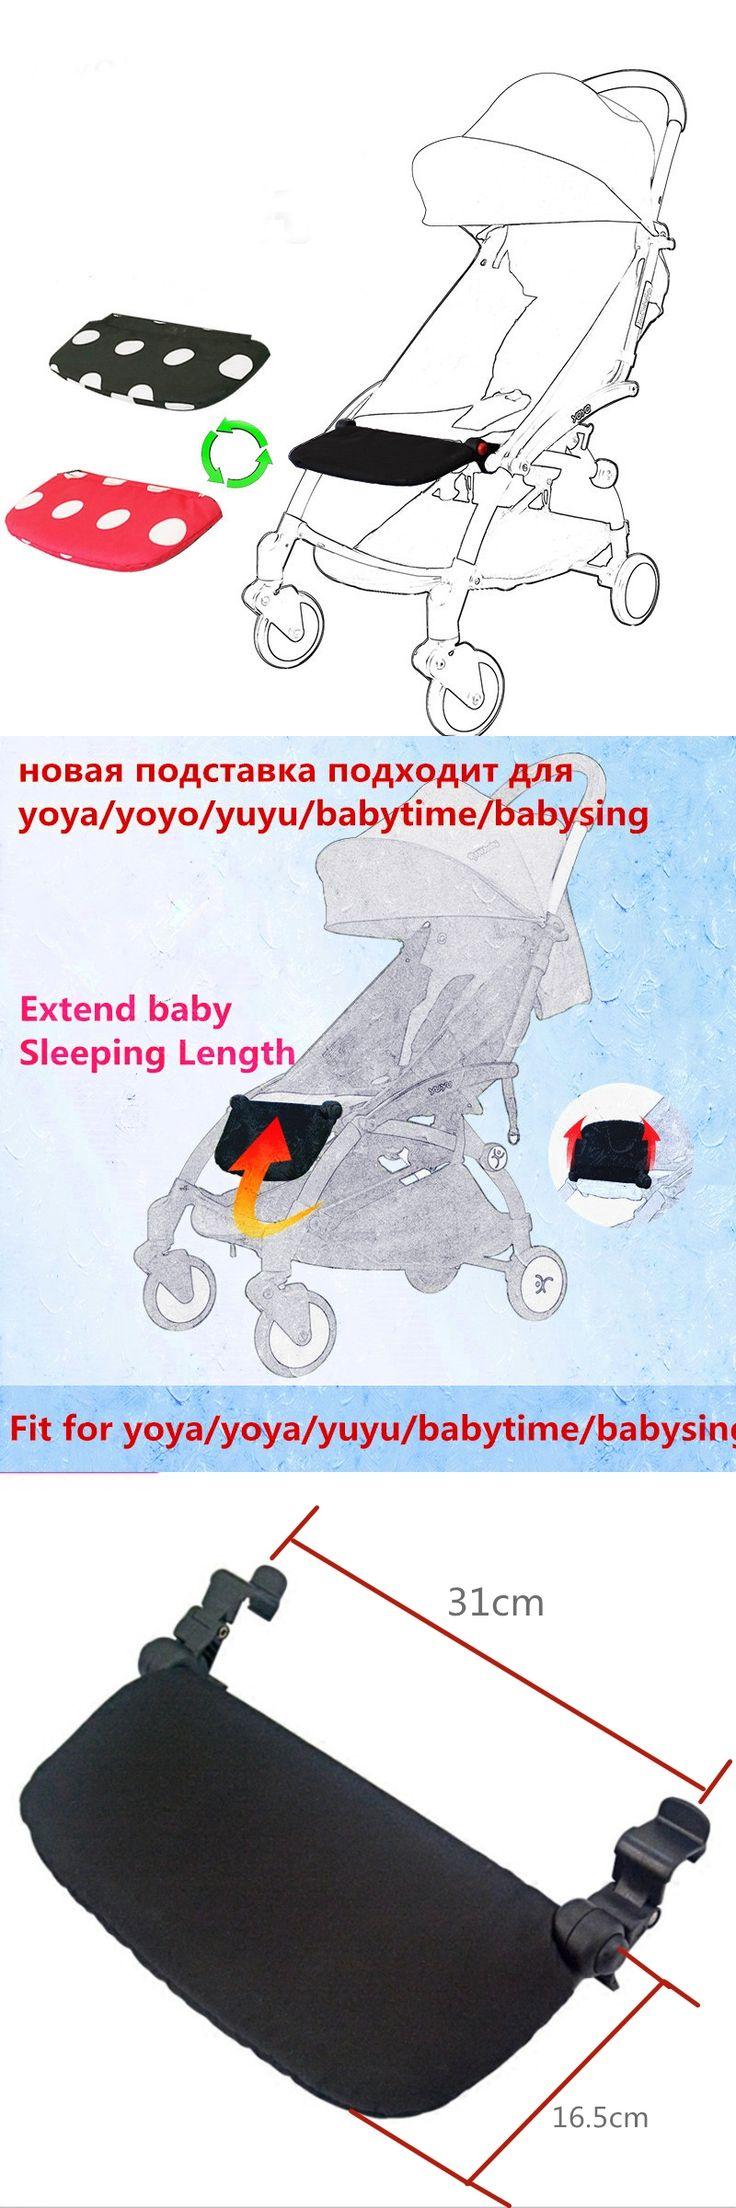 2017 new baby stroller accessory footrest black 16cm longer general footboard for babytime yoya stroller baby sleep extend boar